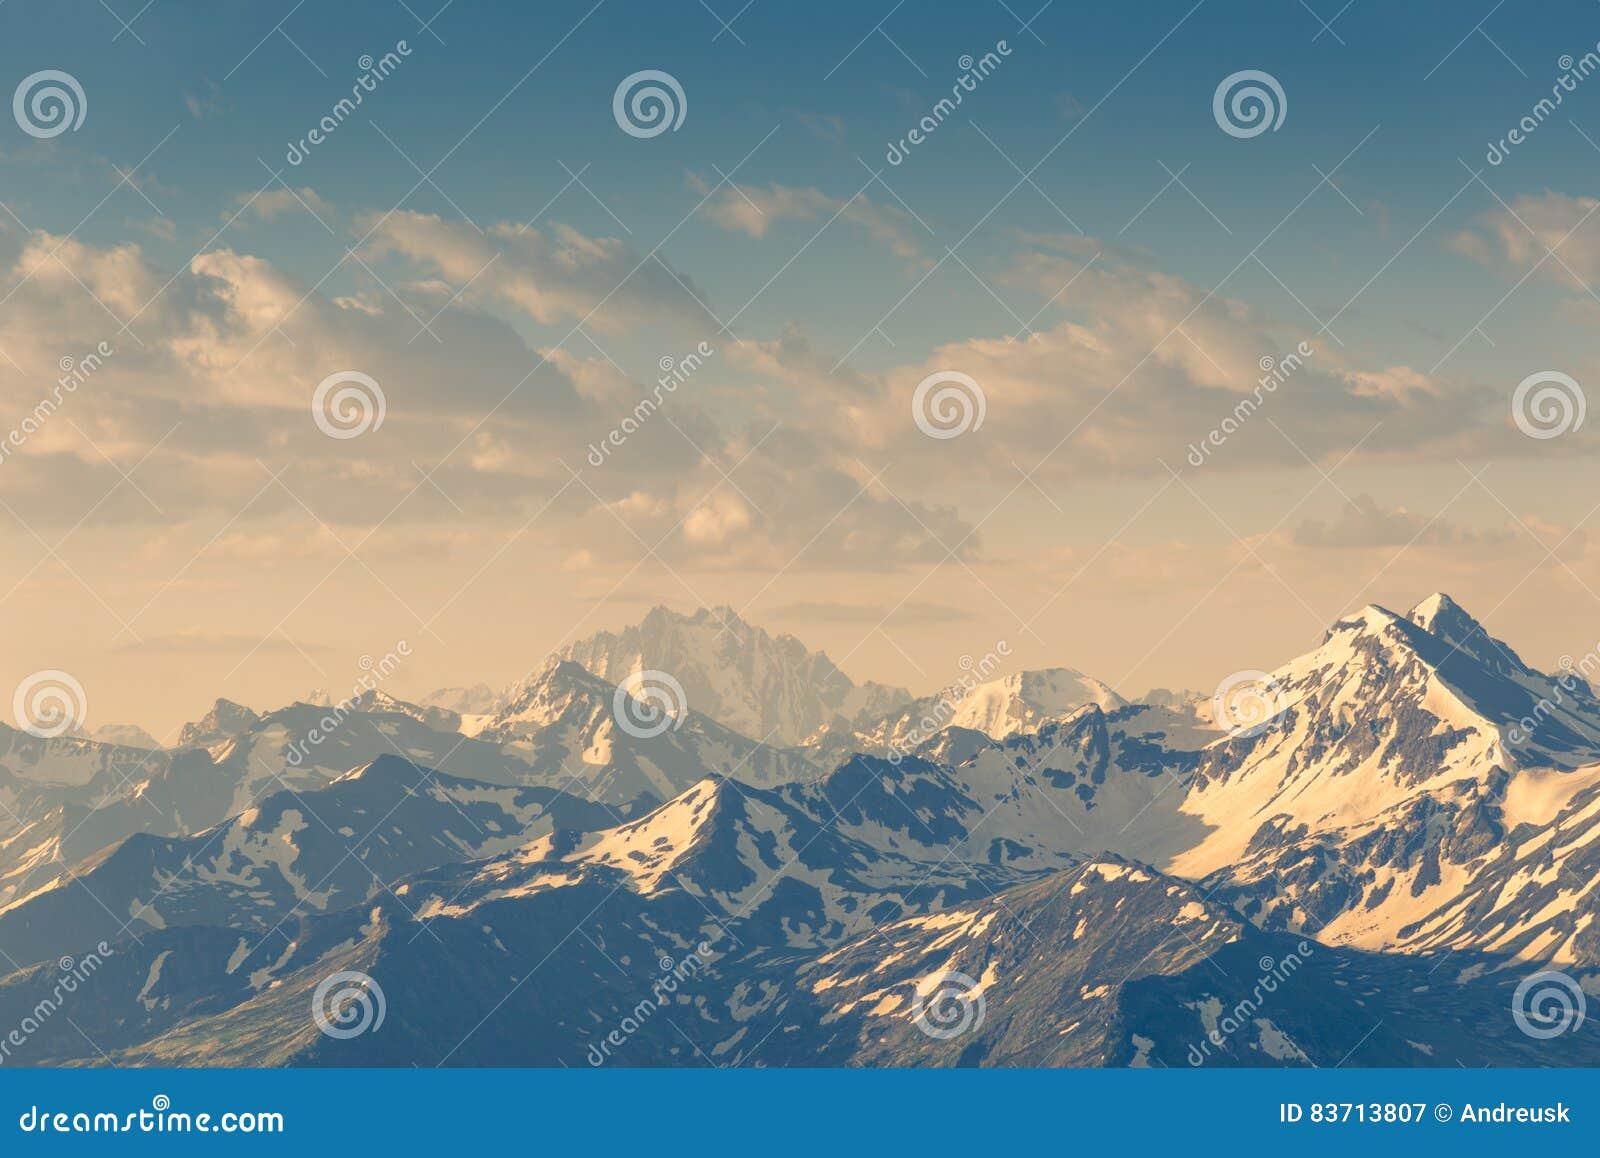 A Mountains Landscape Stock Photo